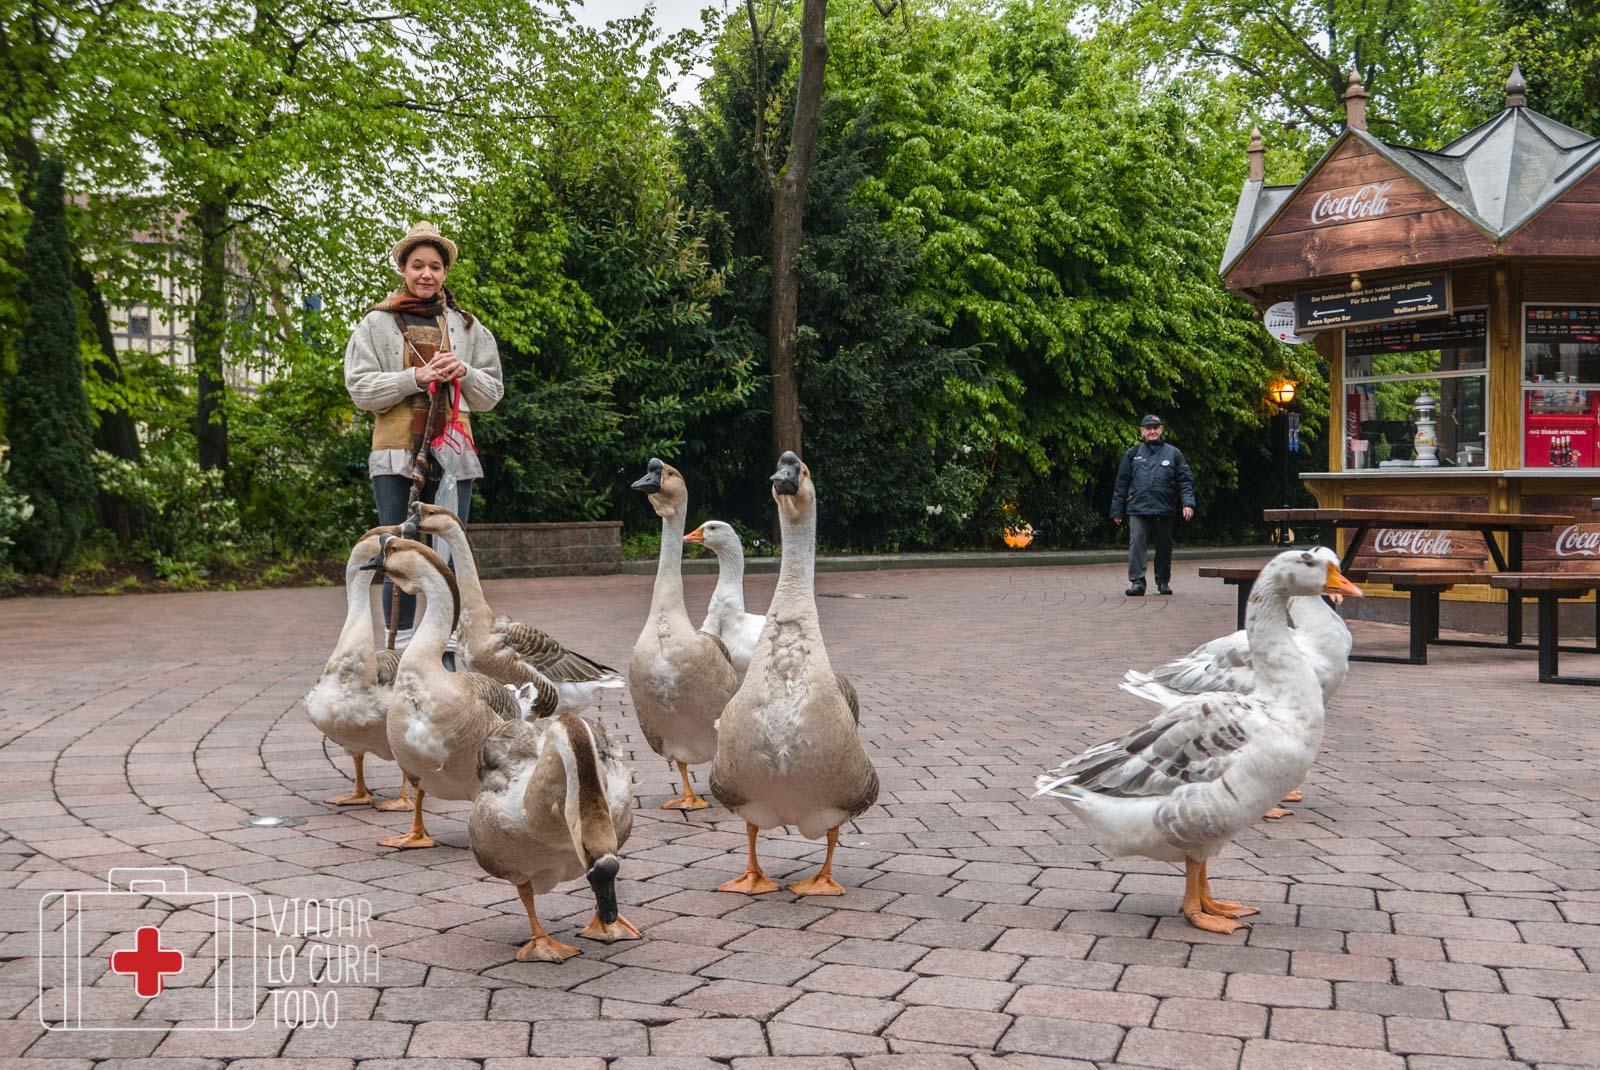 Europa Park animals